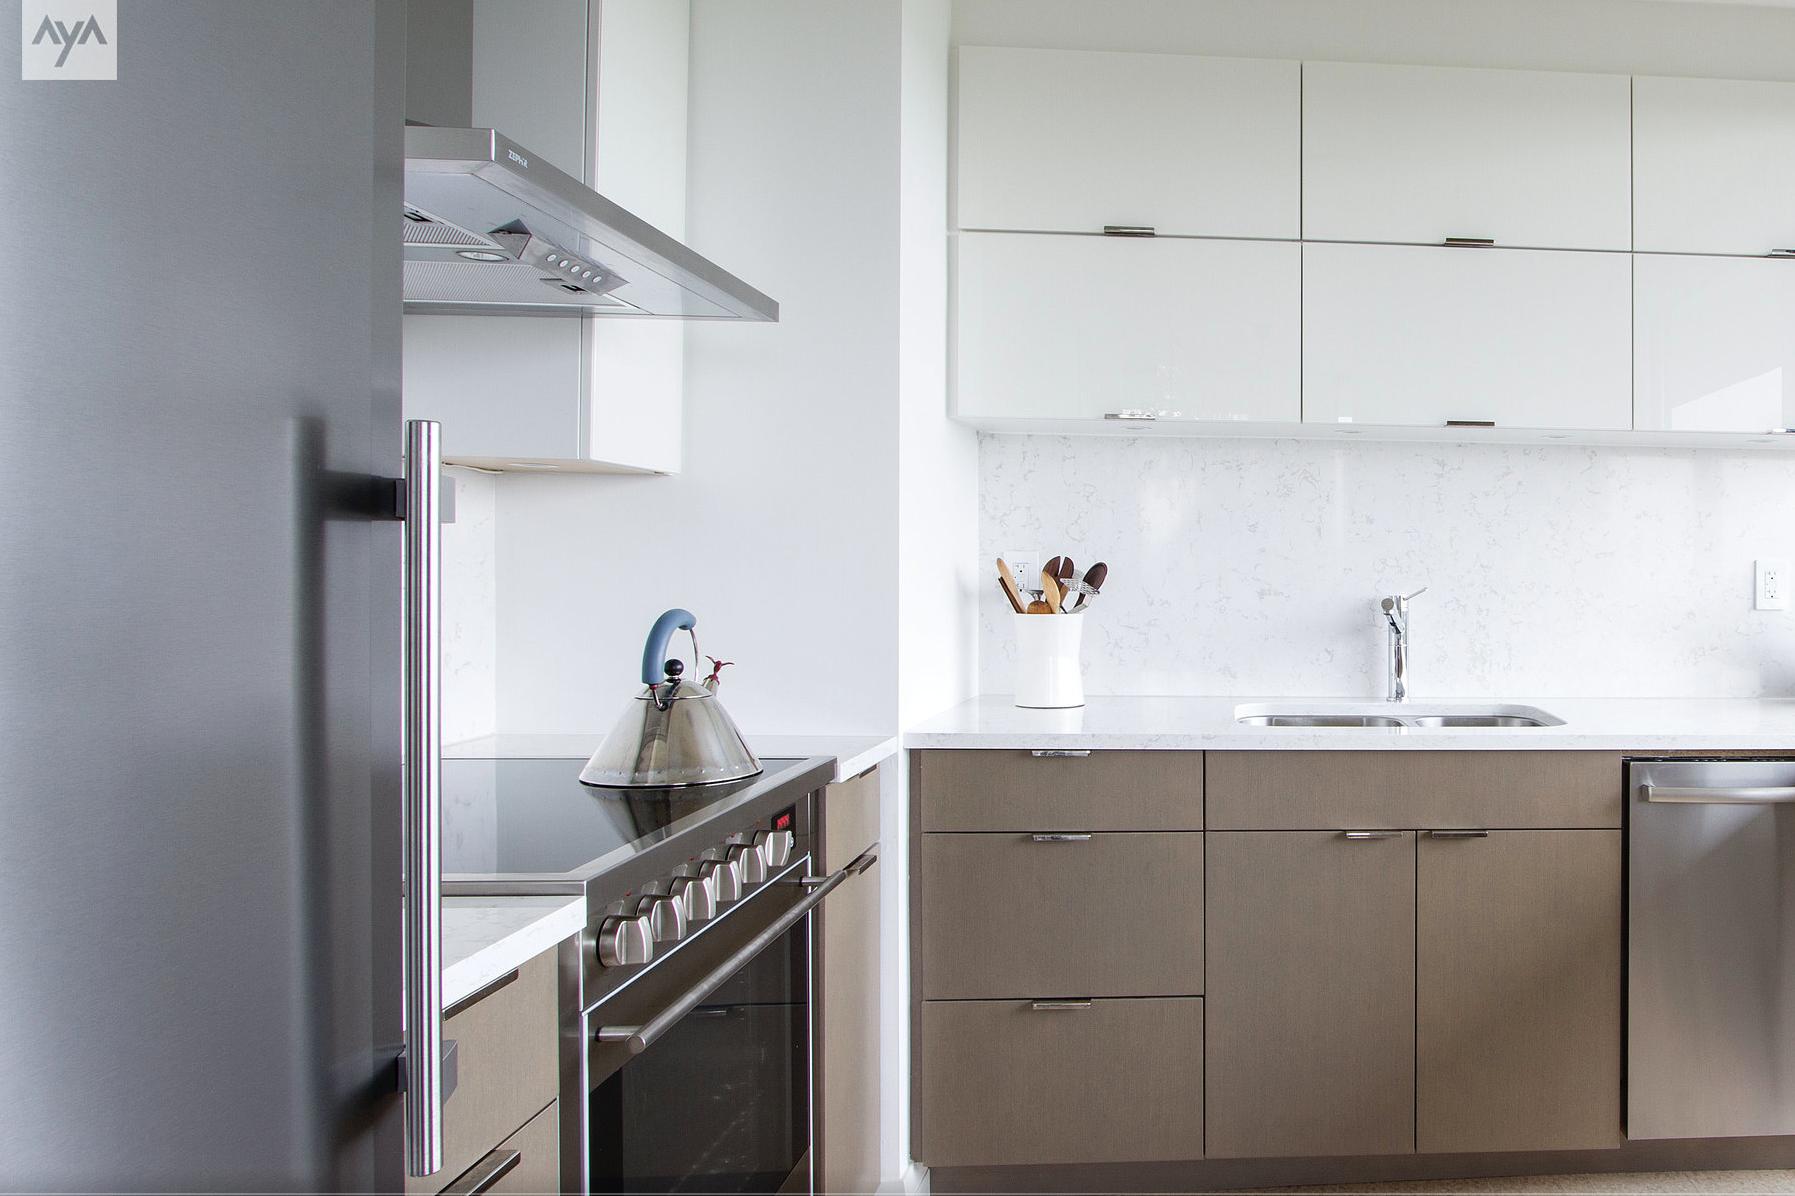 Kitchen Cabinets Sudbury Innovative Kitchens By Design